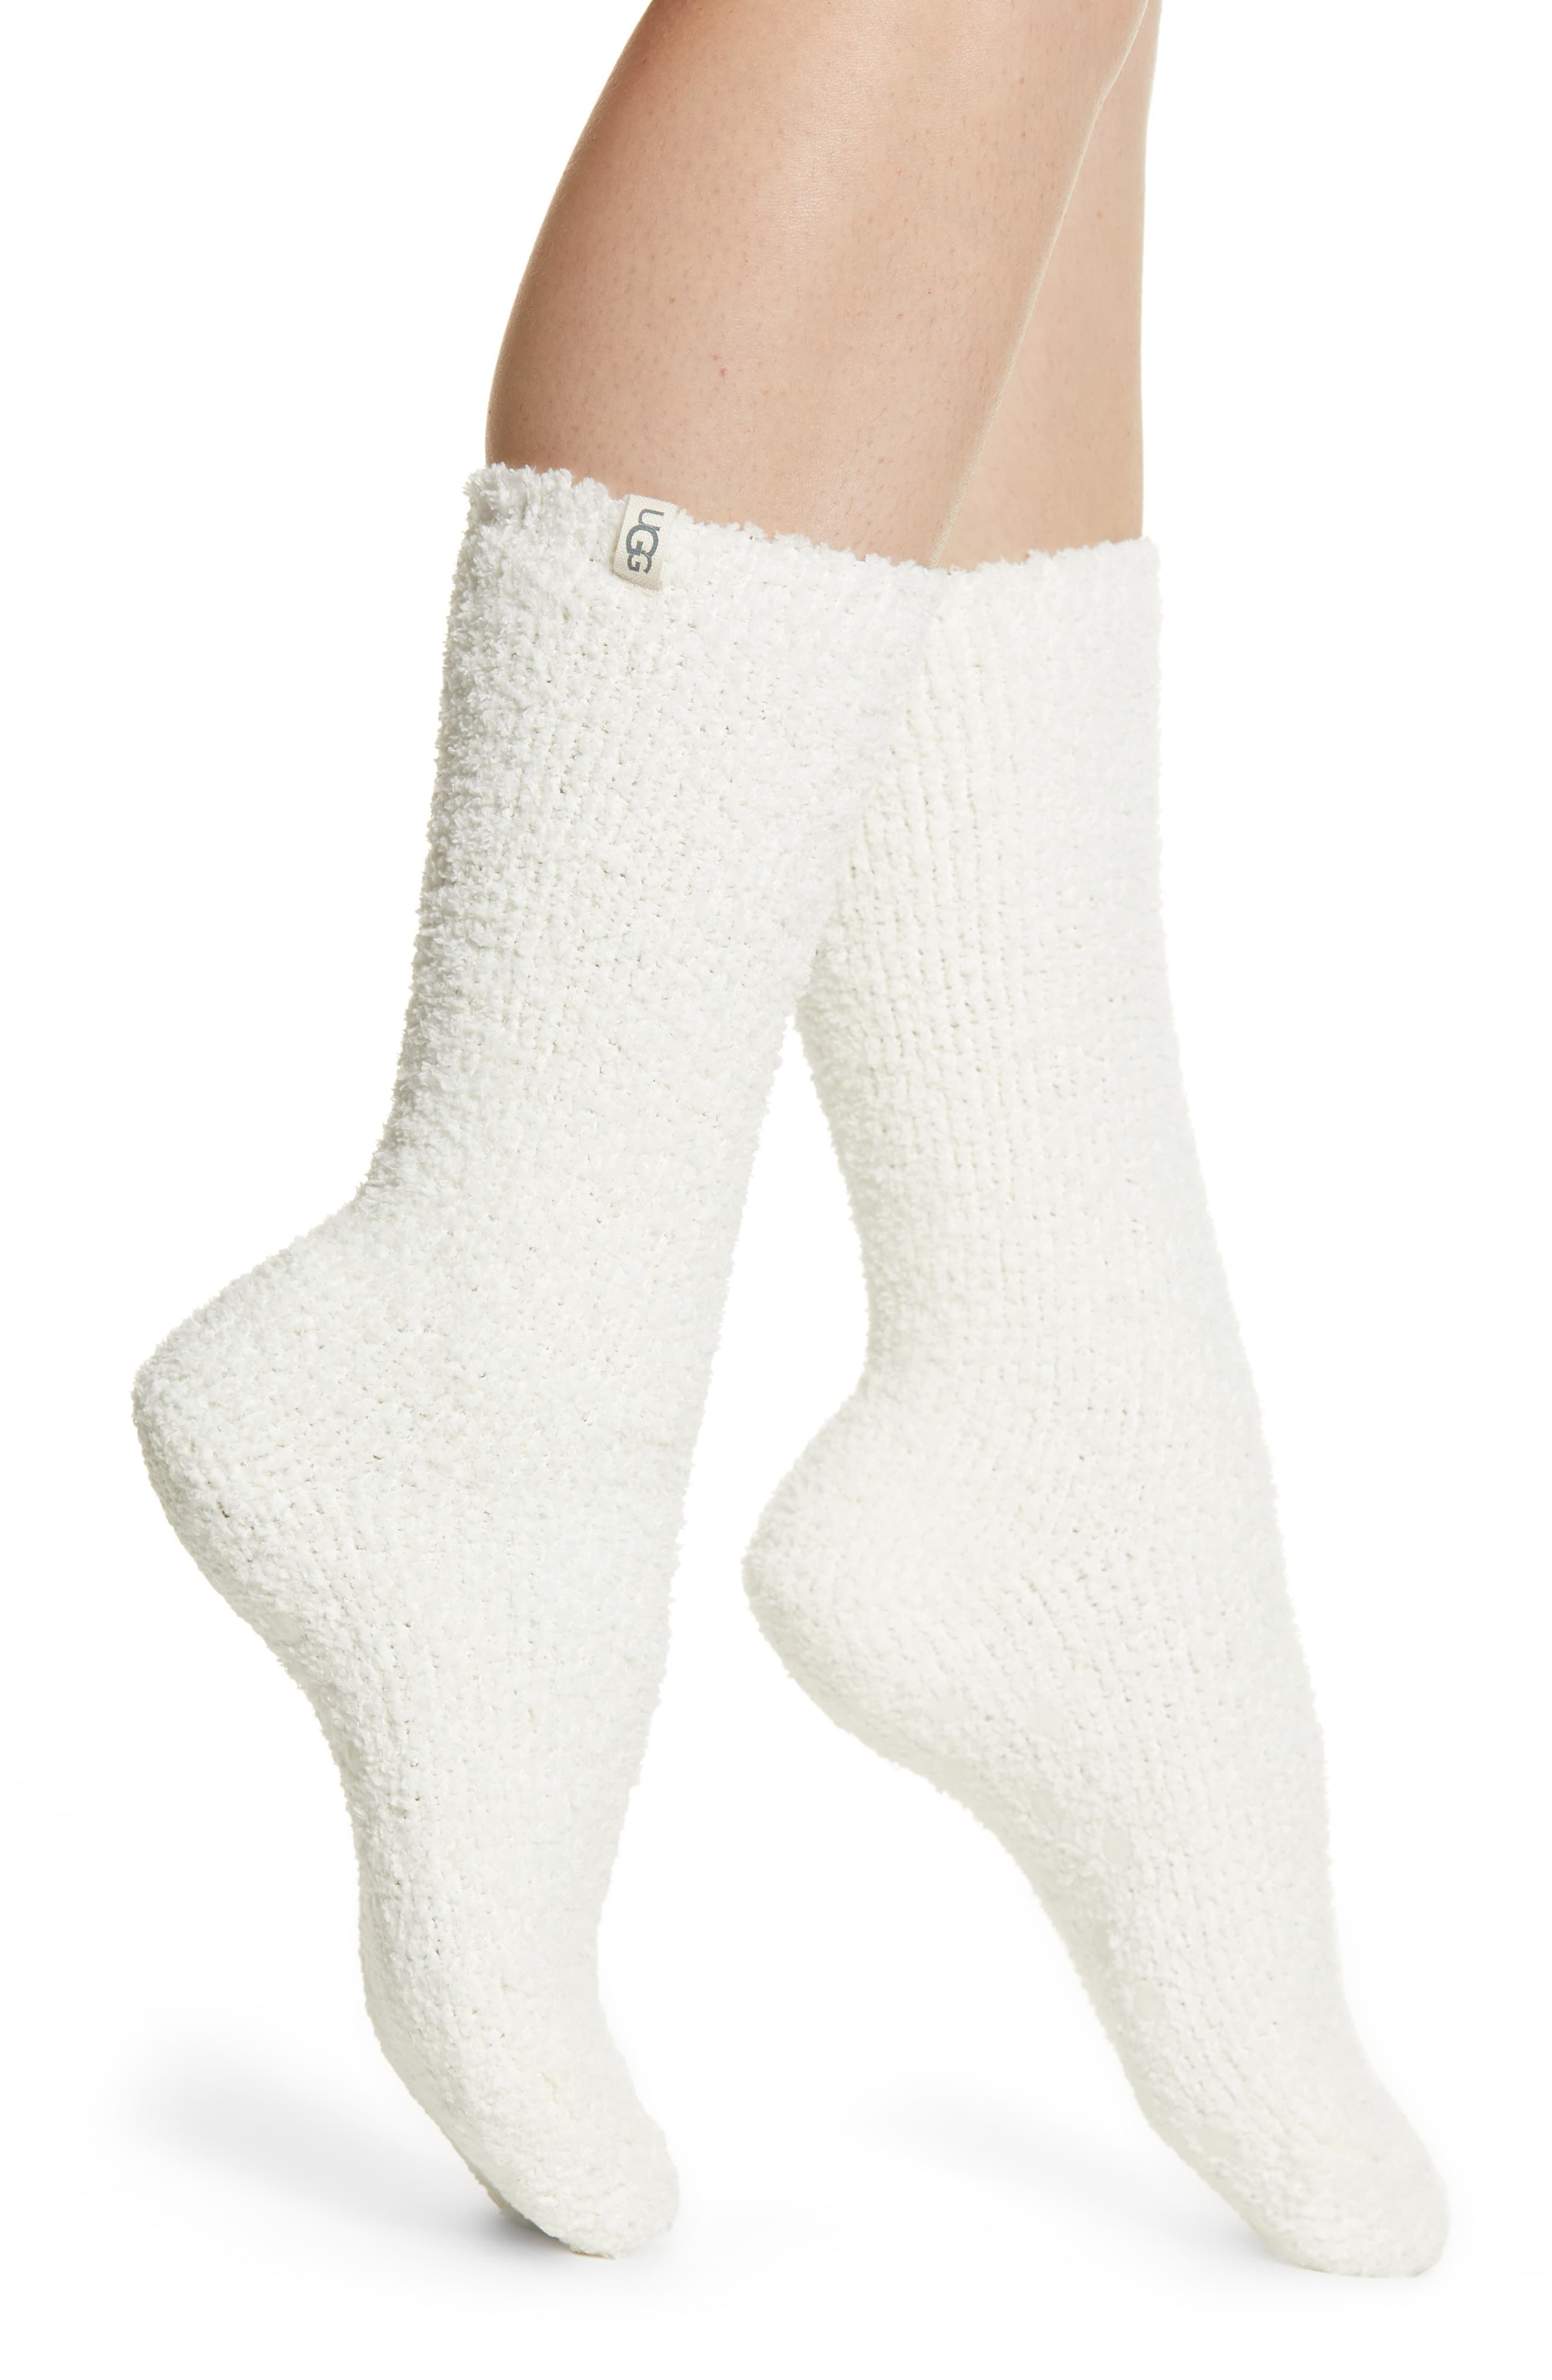 Women's UGG Alice Cozy Gripper Socks, Size One Size - White